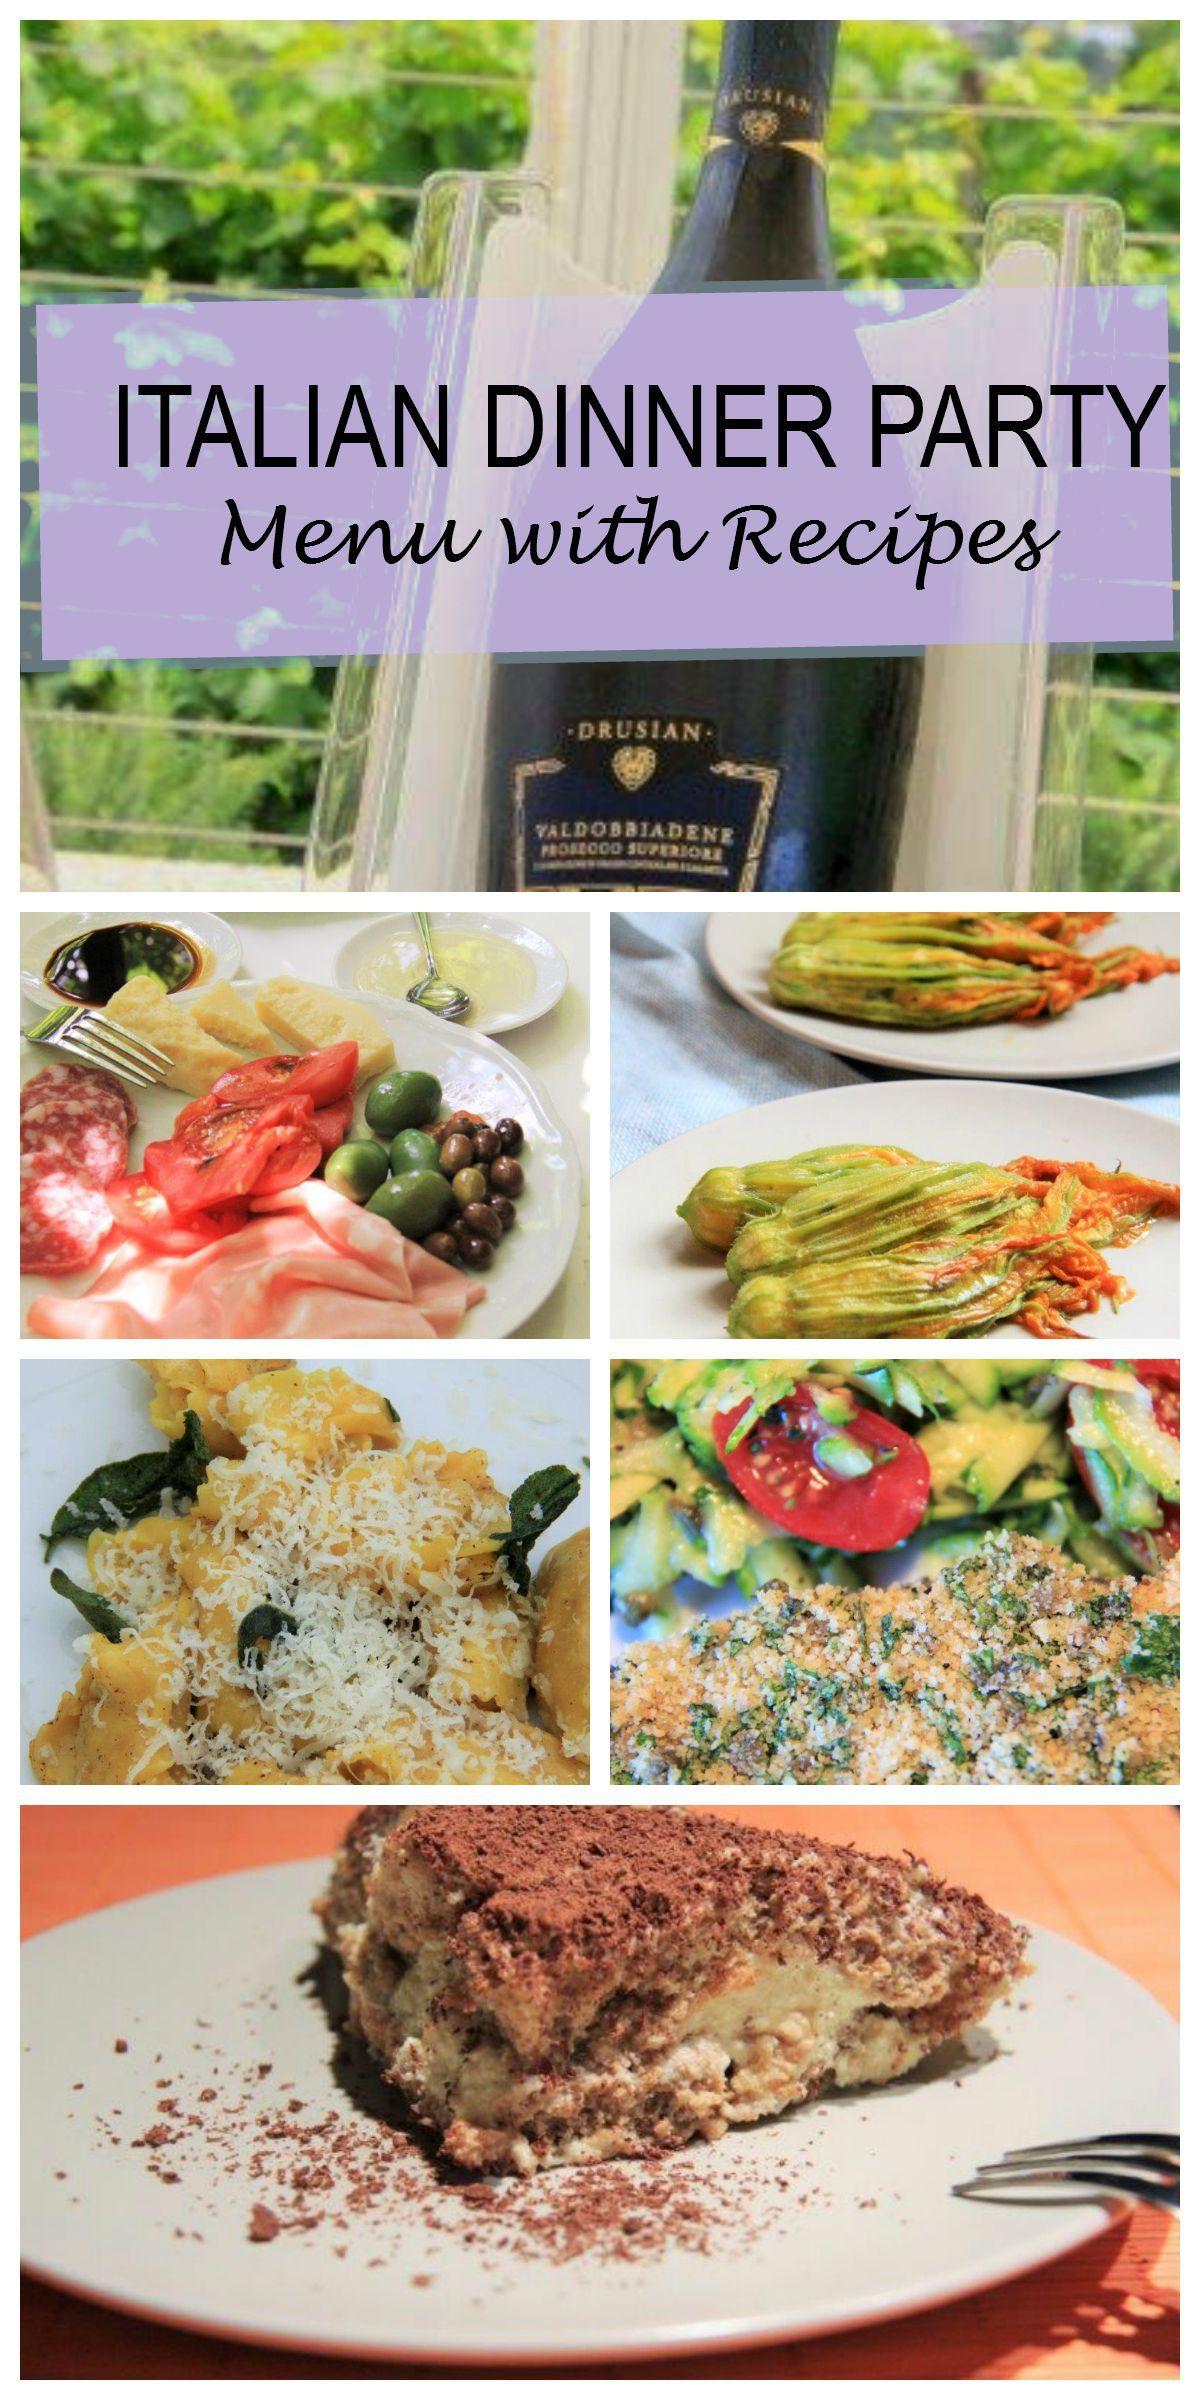 Italian Dinner Ideas  Italian Dinner Party Menu plete with Recipes for Easy